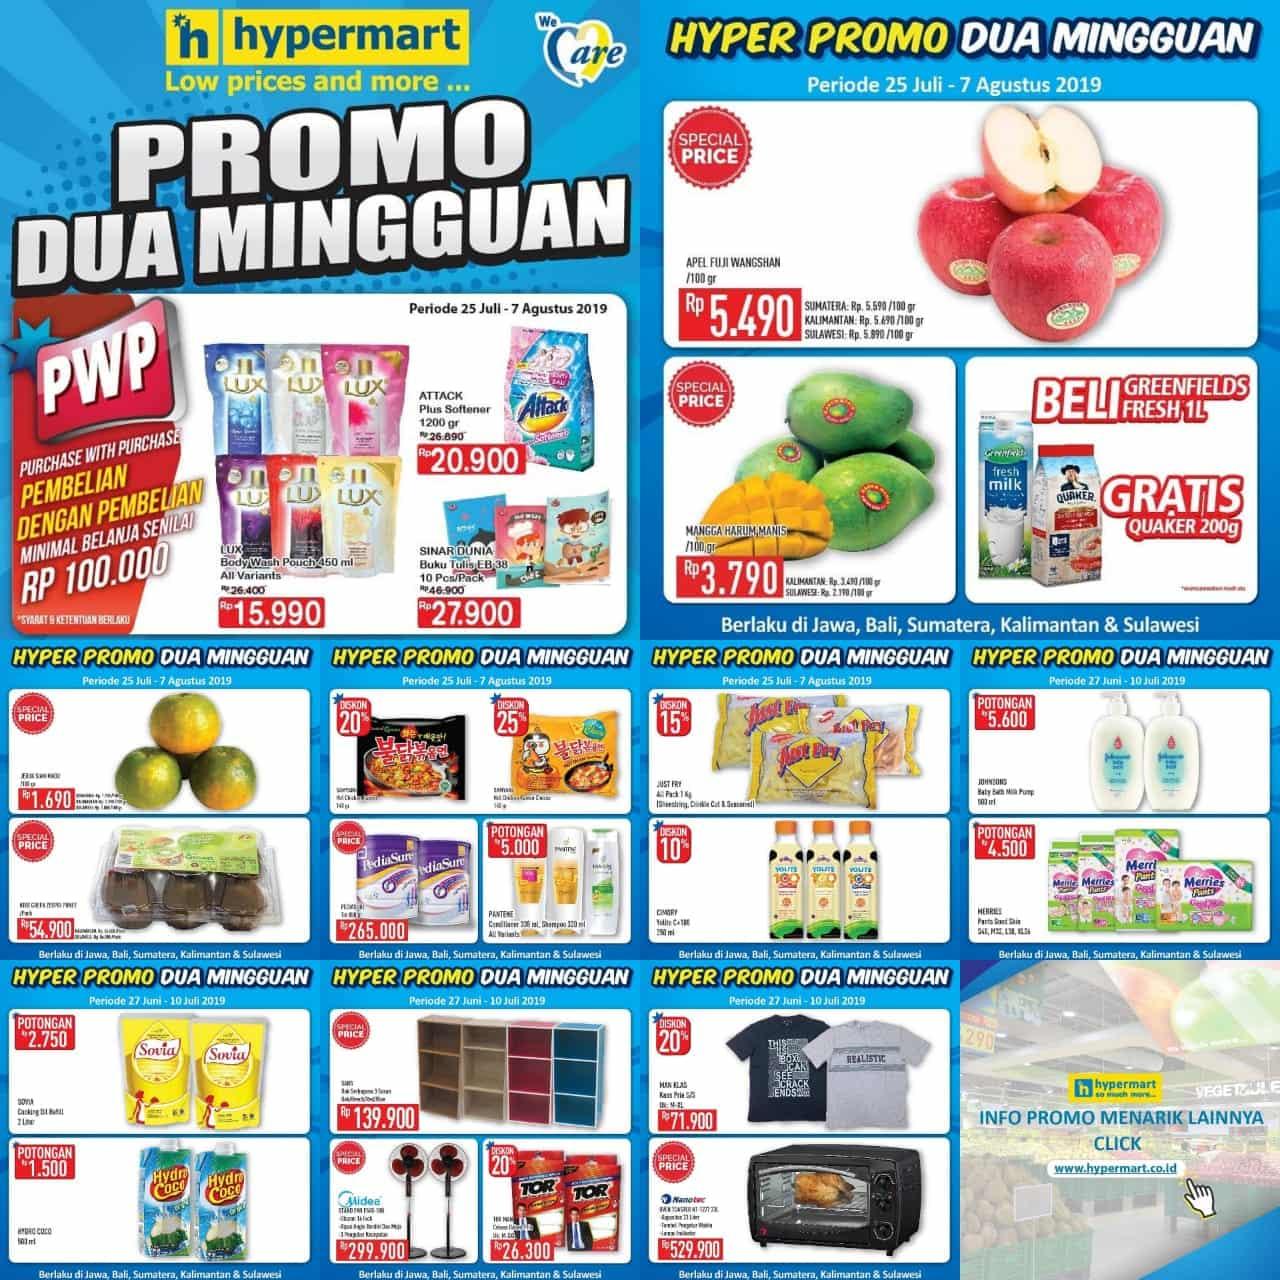 Diskon Katalog Promo Hypermart Periode 25 Juli - 7 Agustus 2019